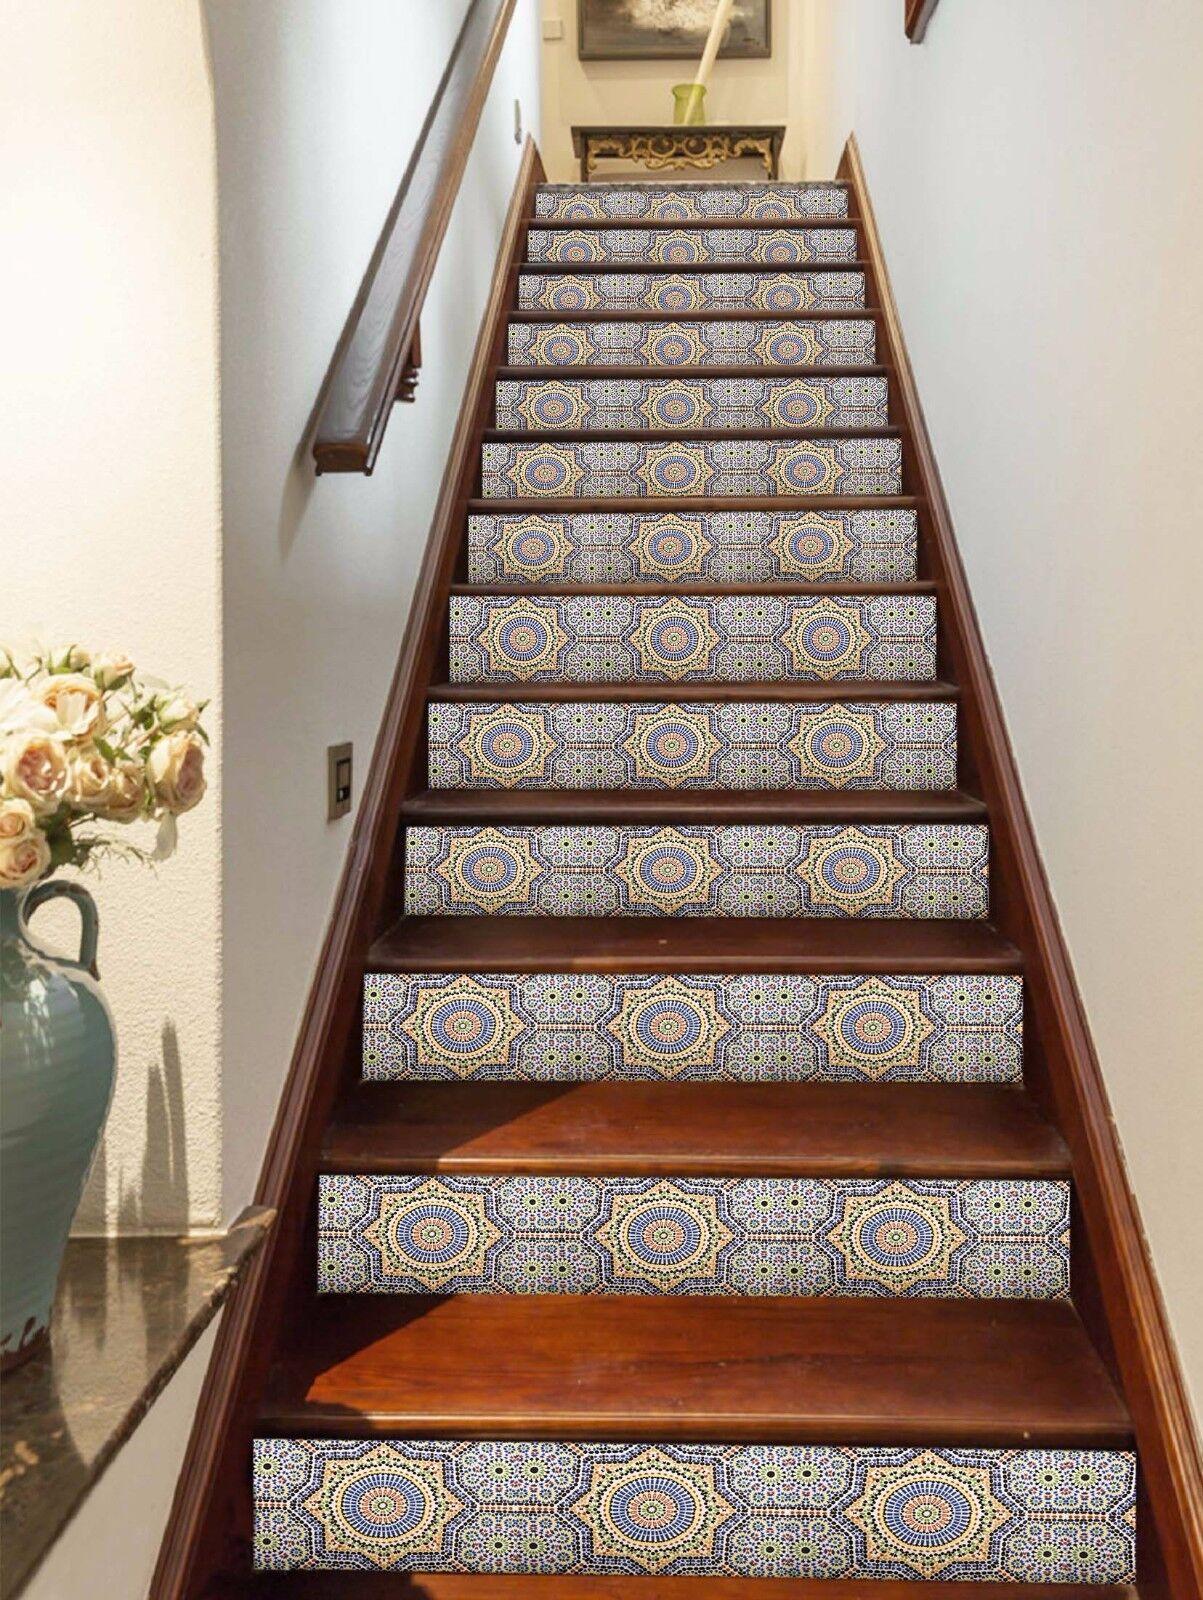 3D Grid 448 Stair Risers Decoration Photo Mural Vinyl Decal Wallpaper UK Lemon